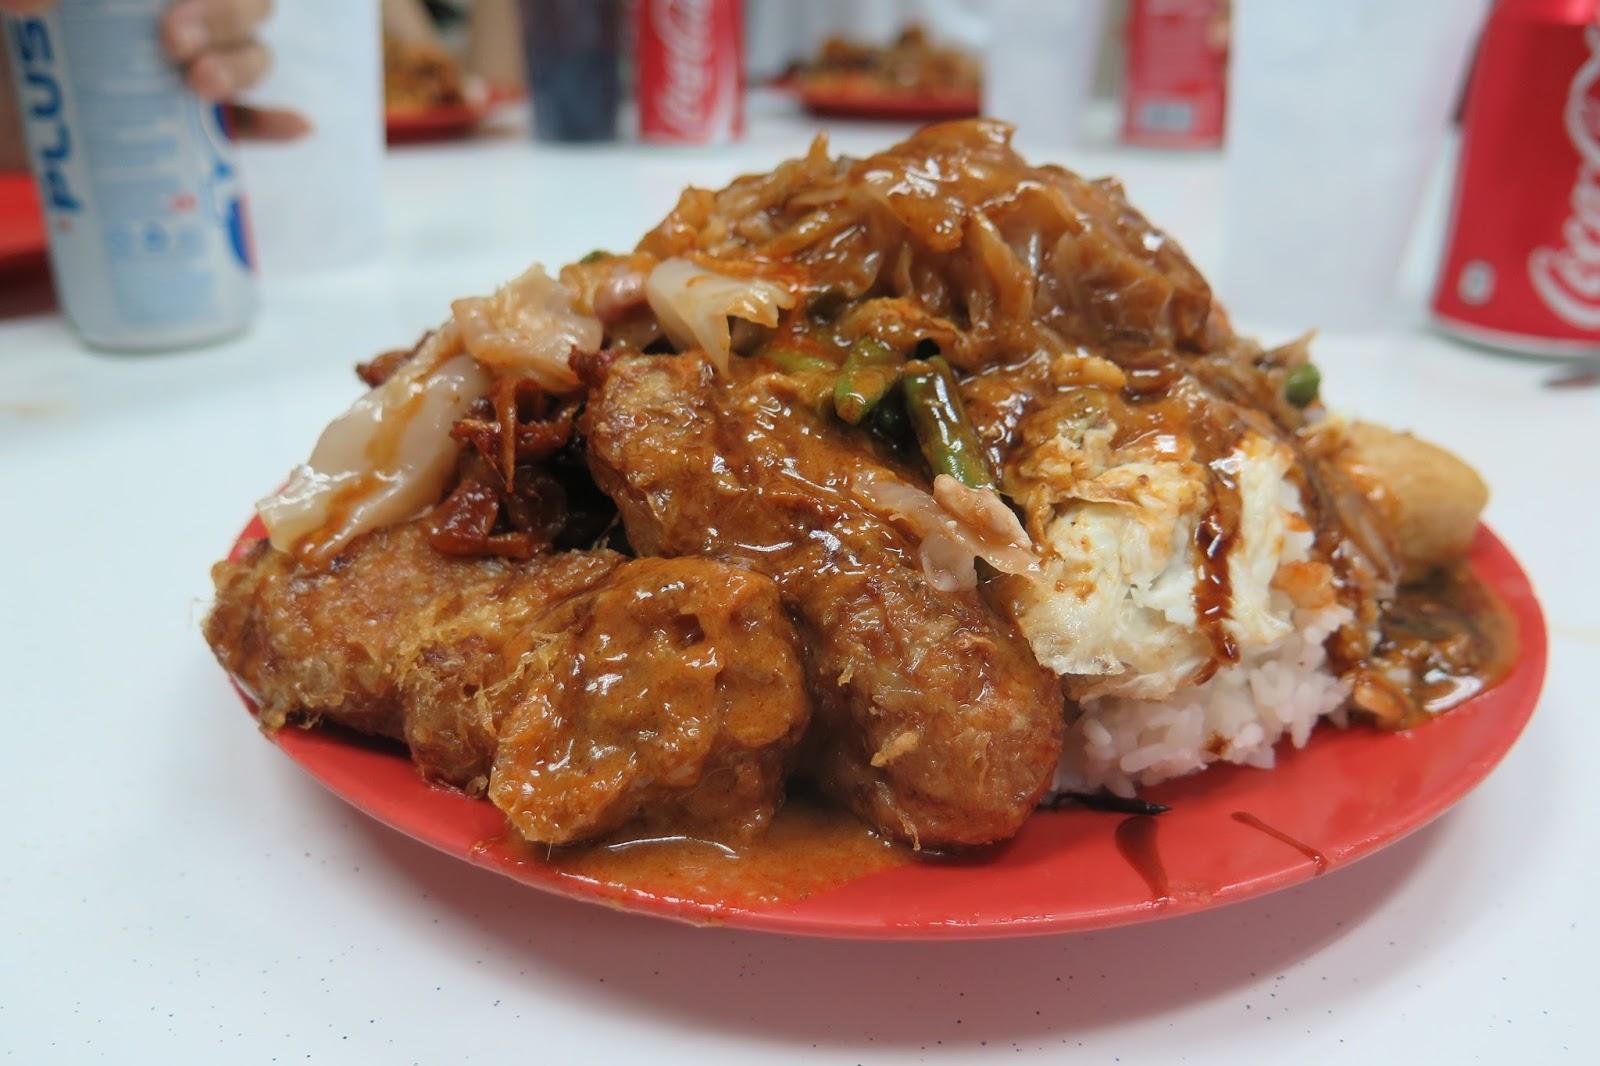 hainanese curry rice scissor cut singapore street hawker food